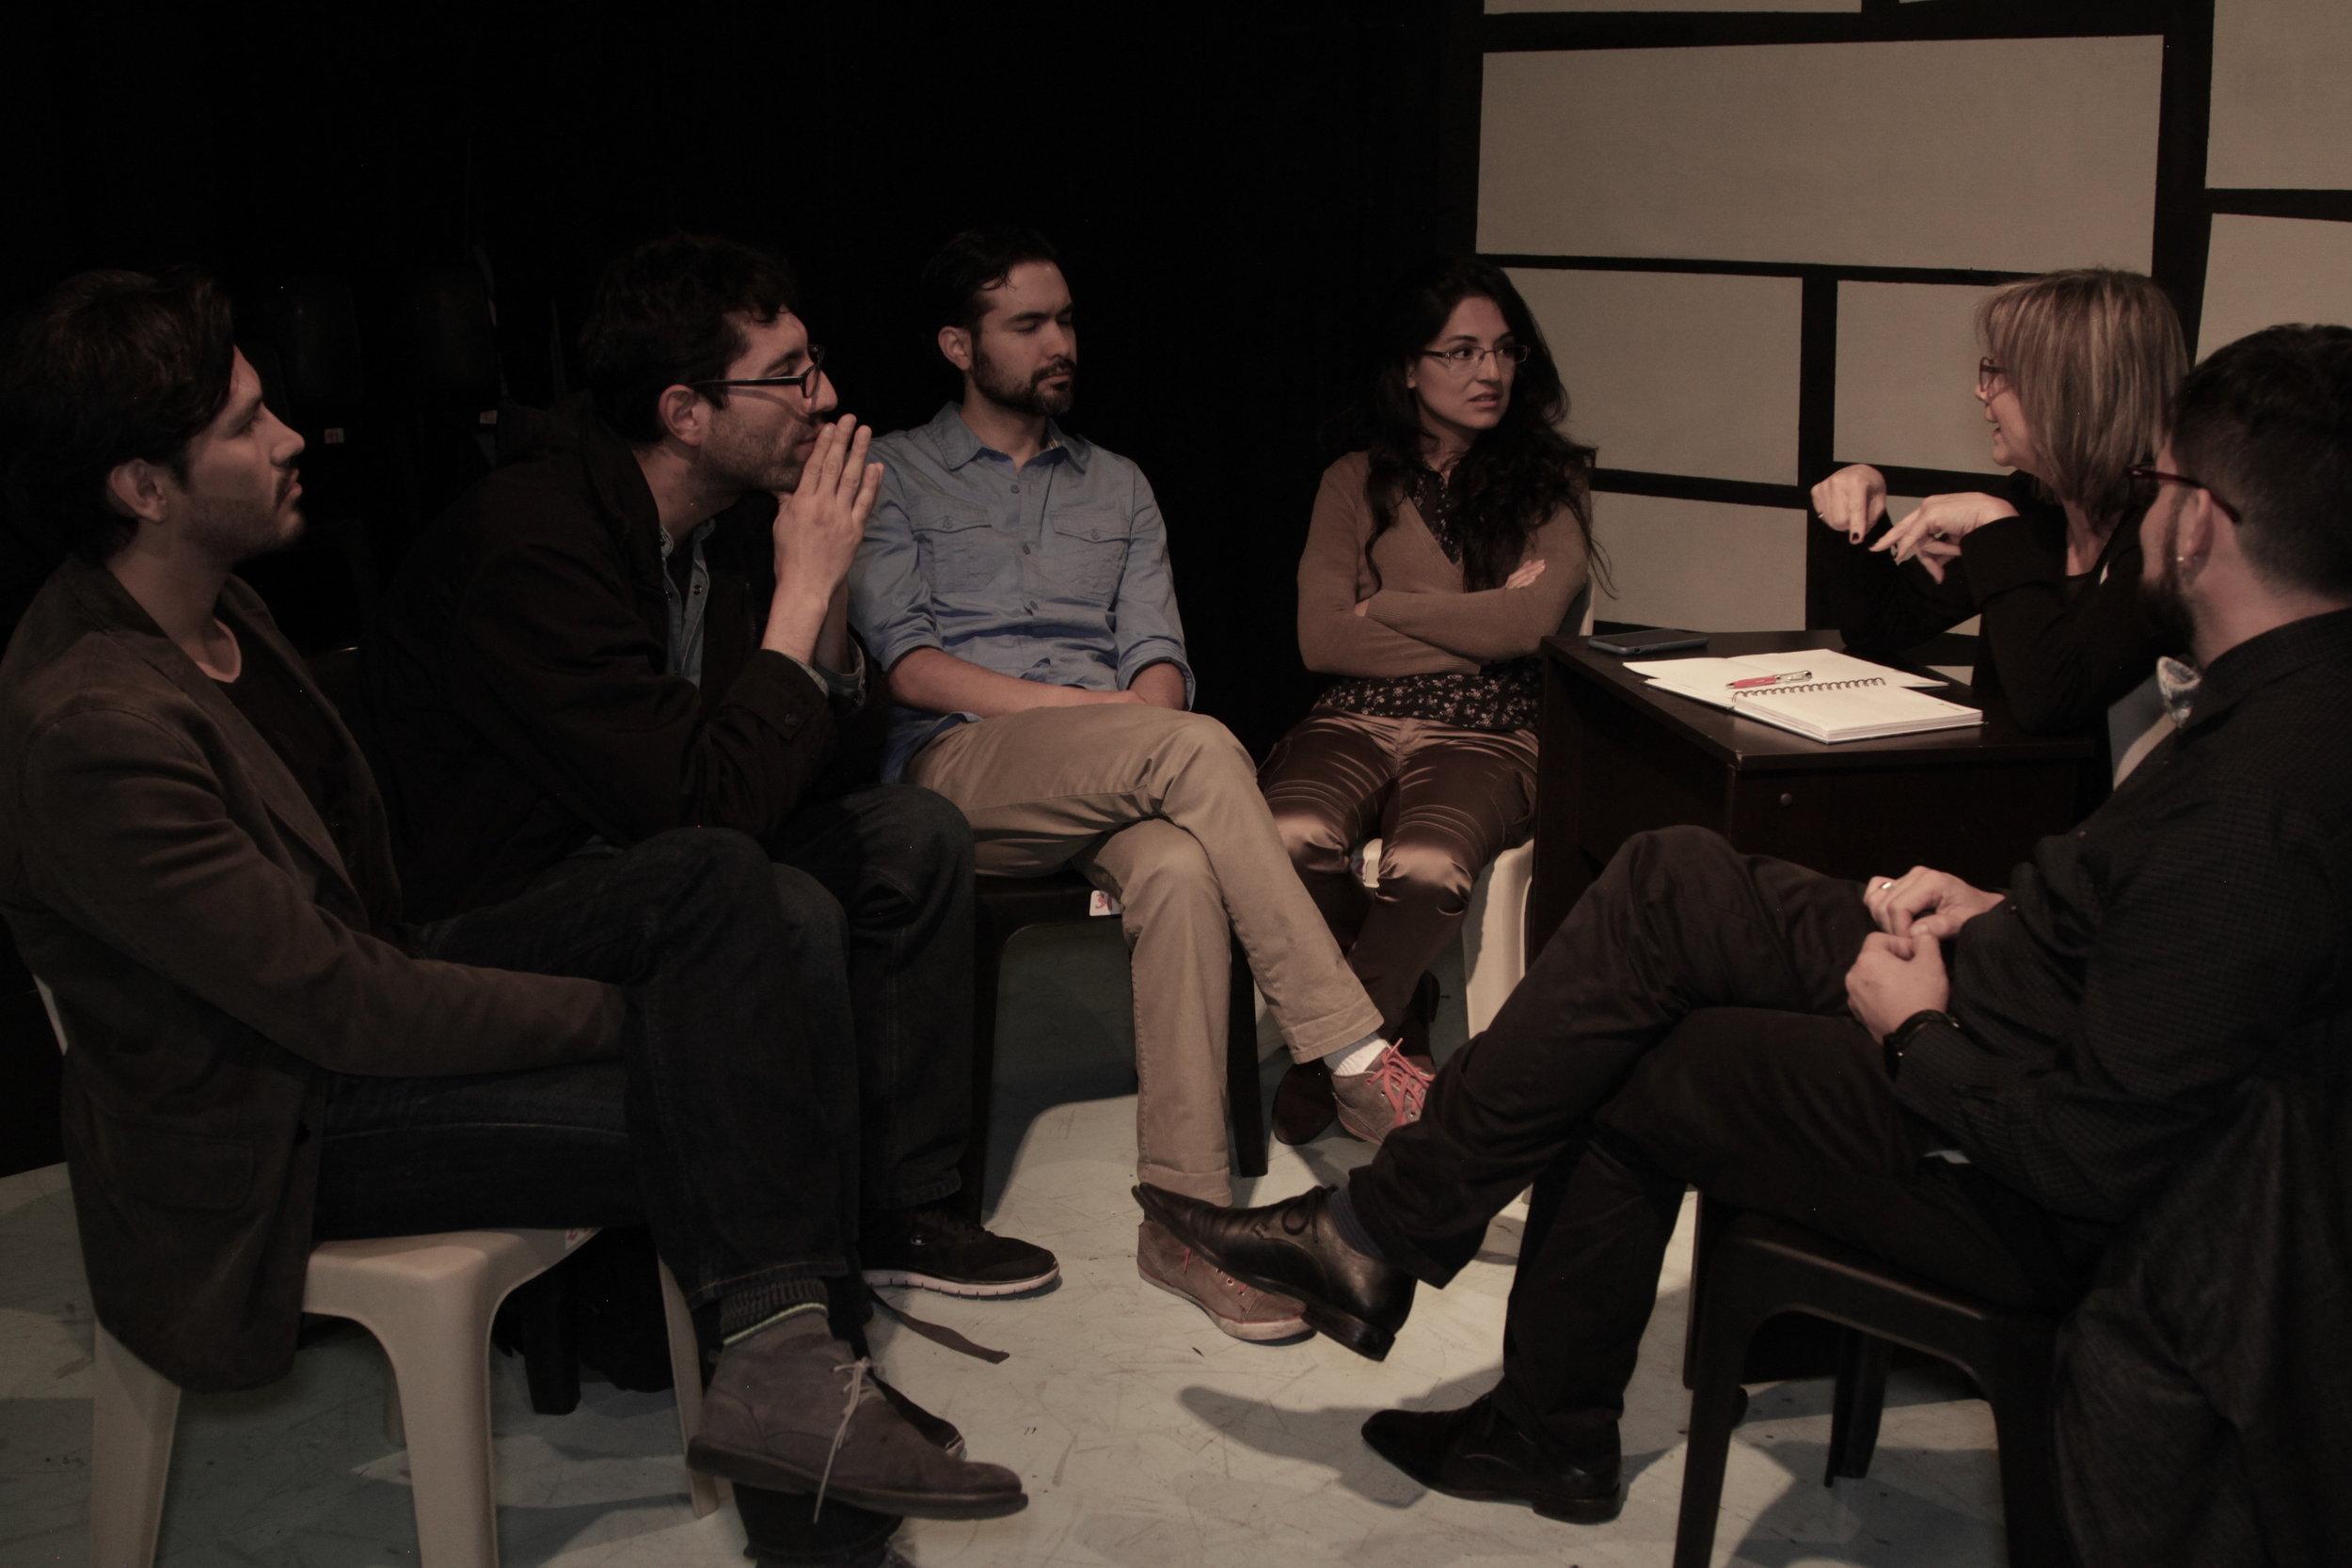 Gonzalo Estupiñán, Diego Coral, Mirian Chicaiza, Leon Sierra,Carlos Páez, y Genoveva Mora